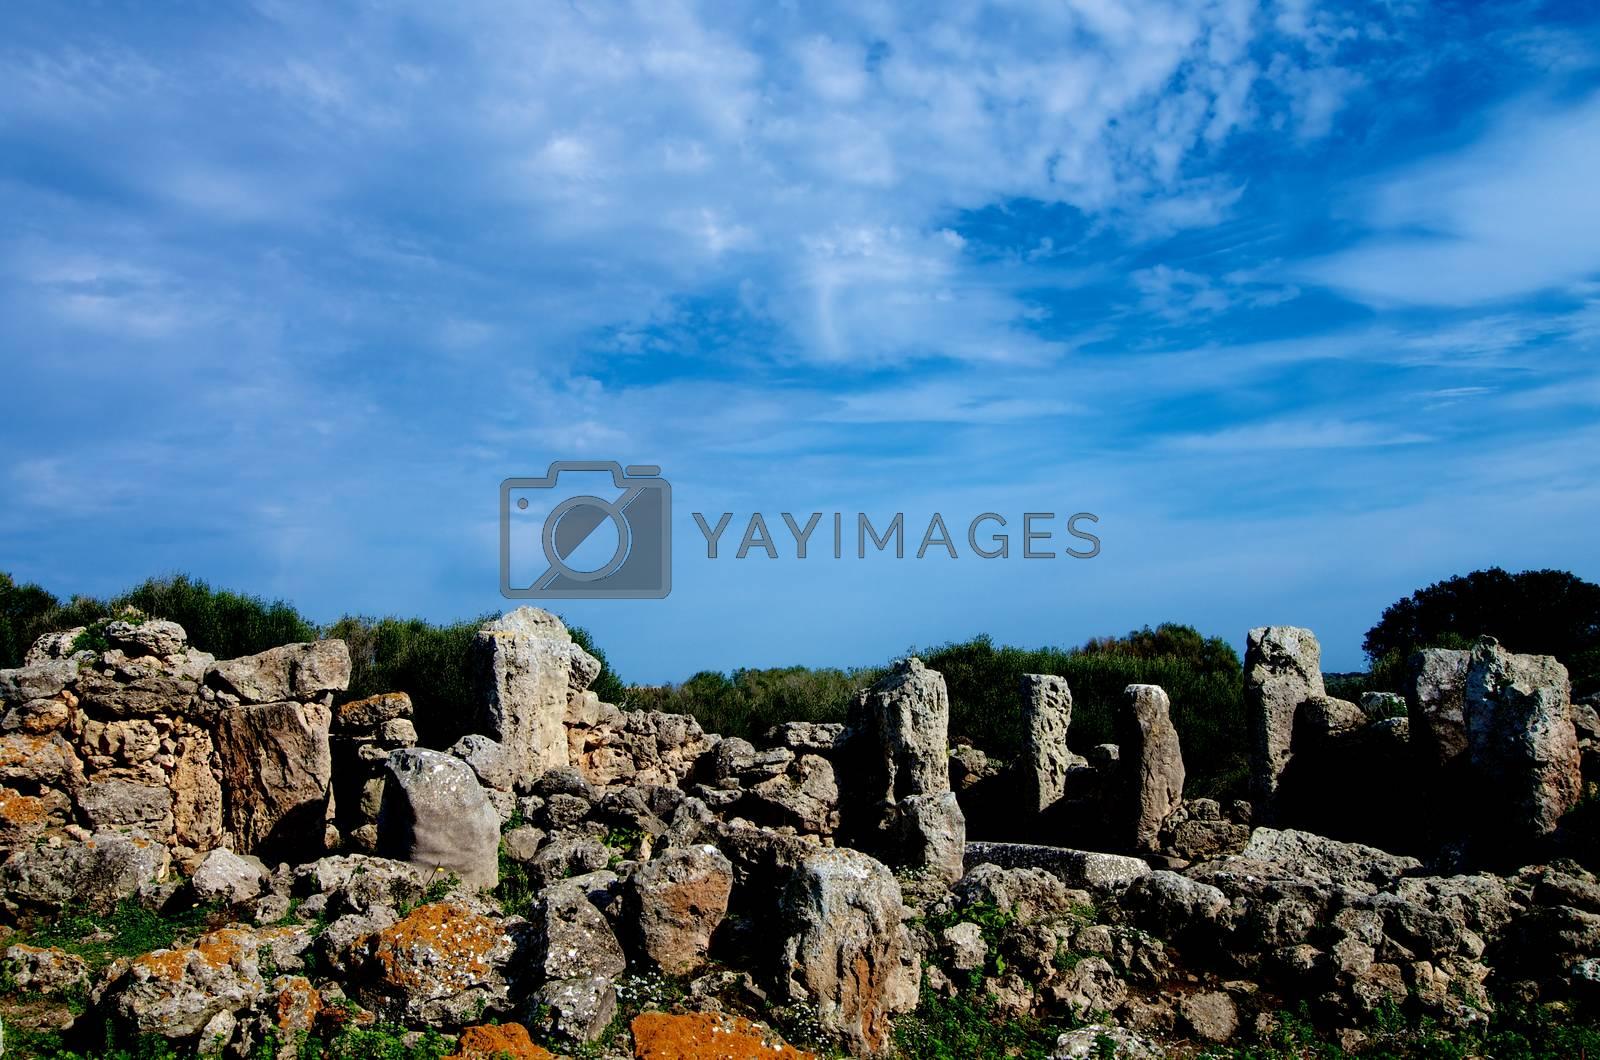 Ancient Megaliths Talaiot Settlement of So na Cacana against Blue Sky Outdoors. Menorca, Balearic Islands